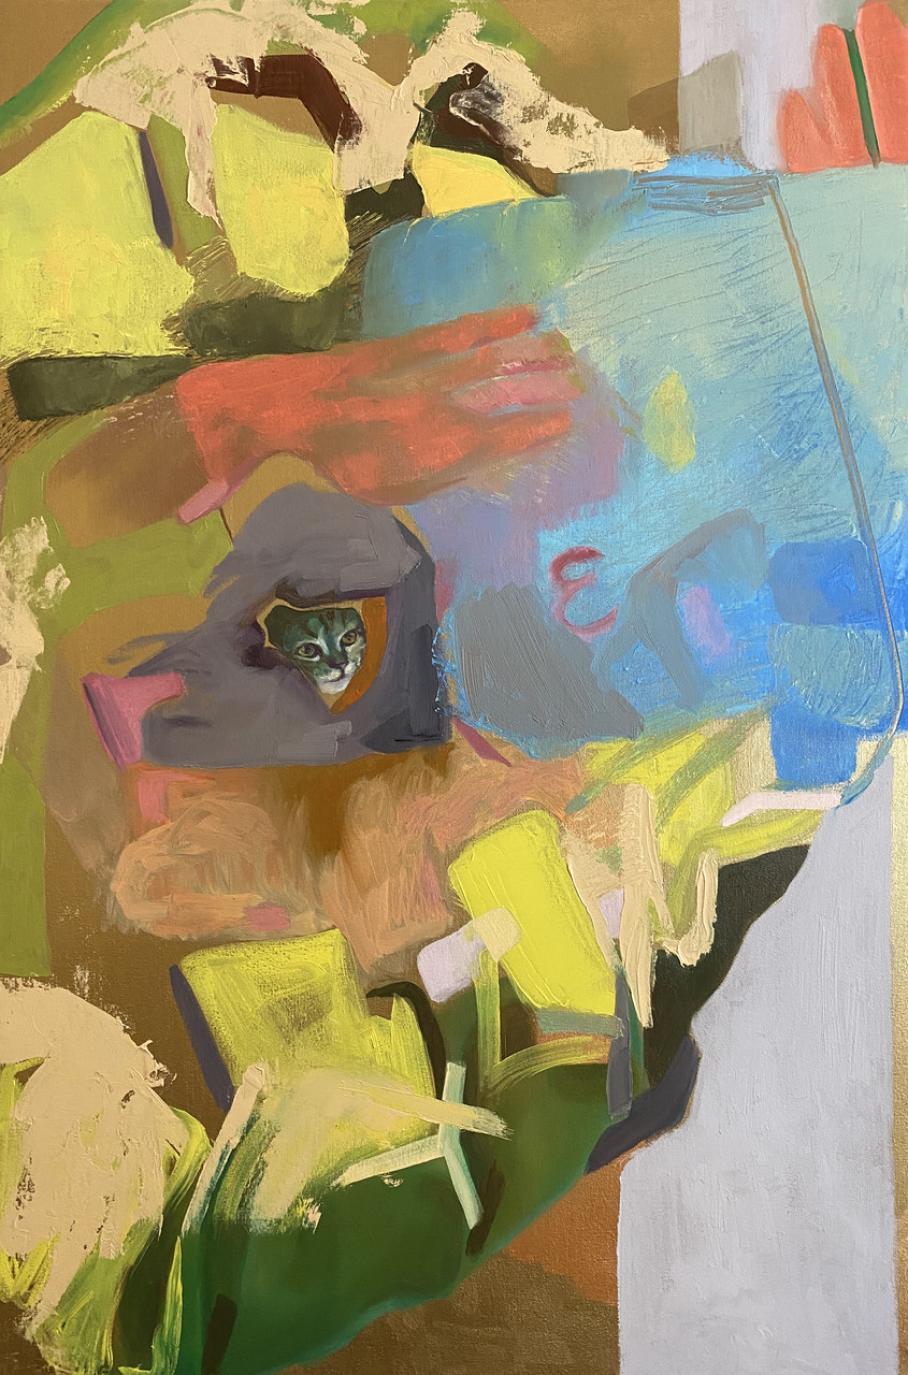 artwork by Yiming Sun, Visual Arts Center, UT Austin